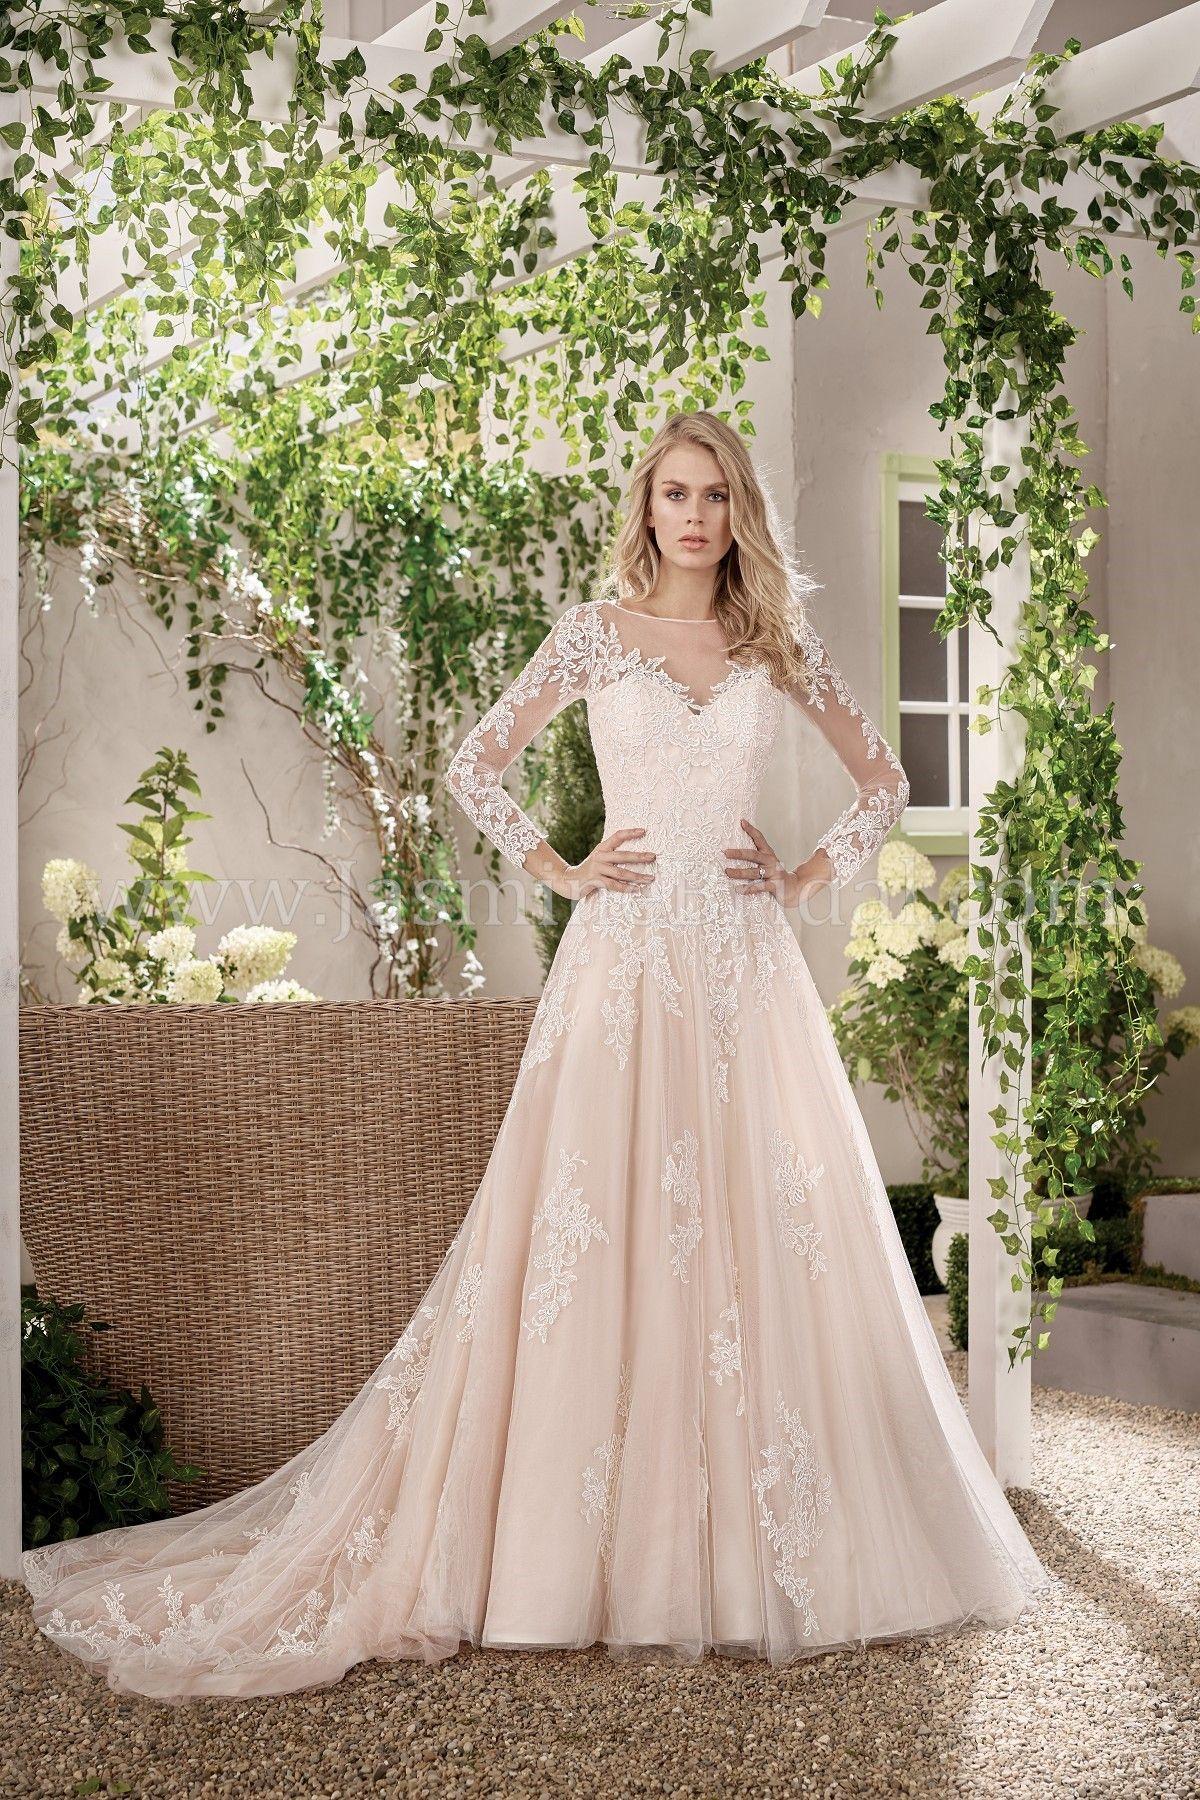 Jasmine wedding dresses  Jasmine Bridal  Collection Style F in Alençon Lace Tulle